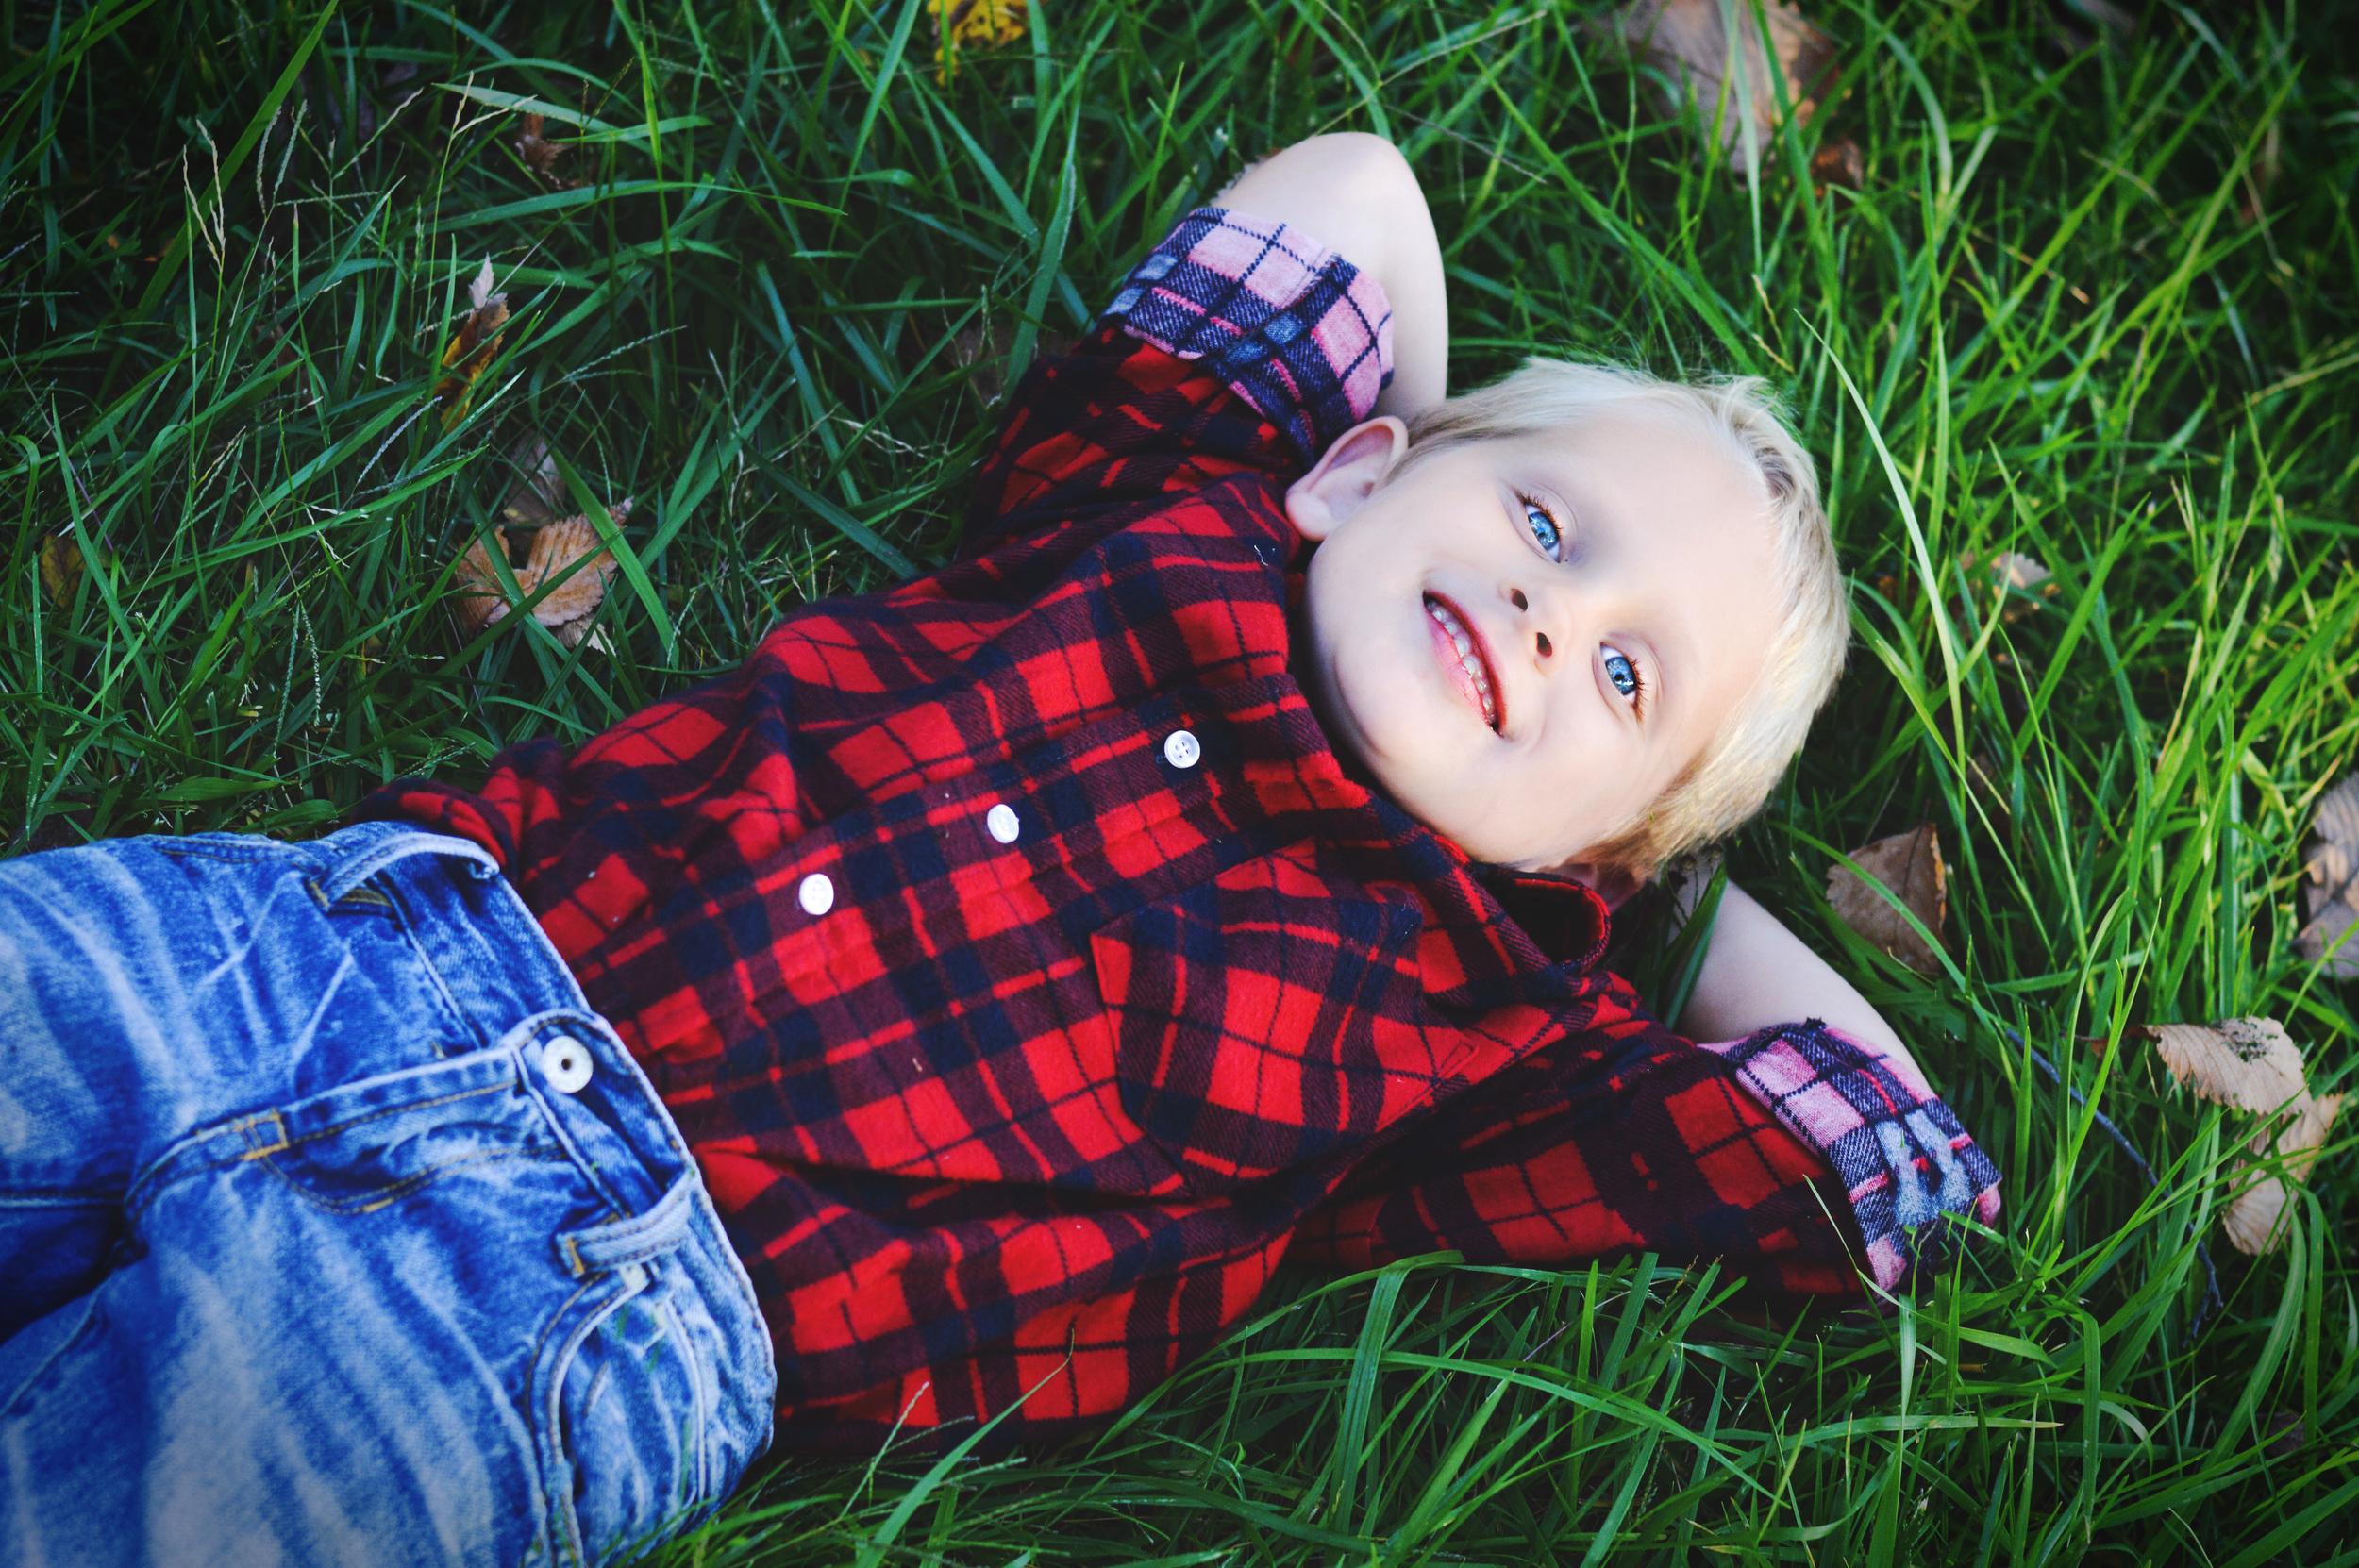 littleboylookingupatskyjoplinmophotosbyariel